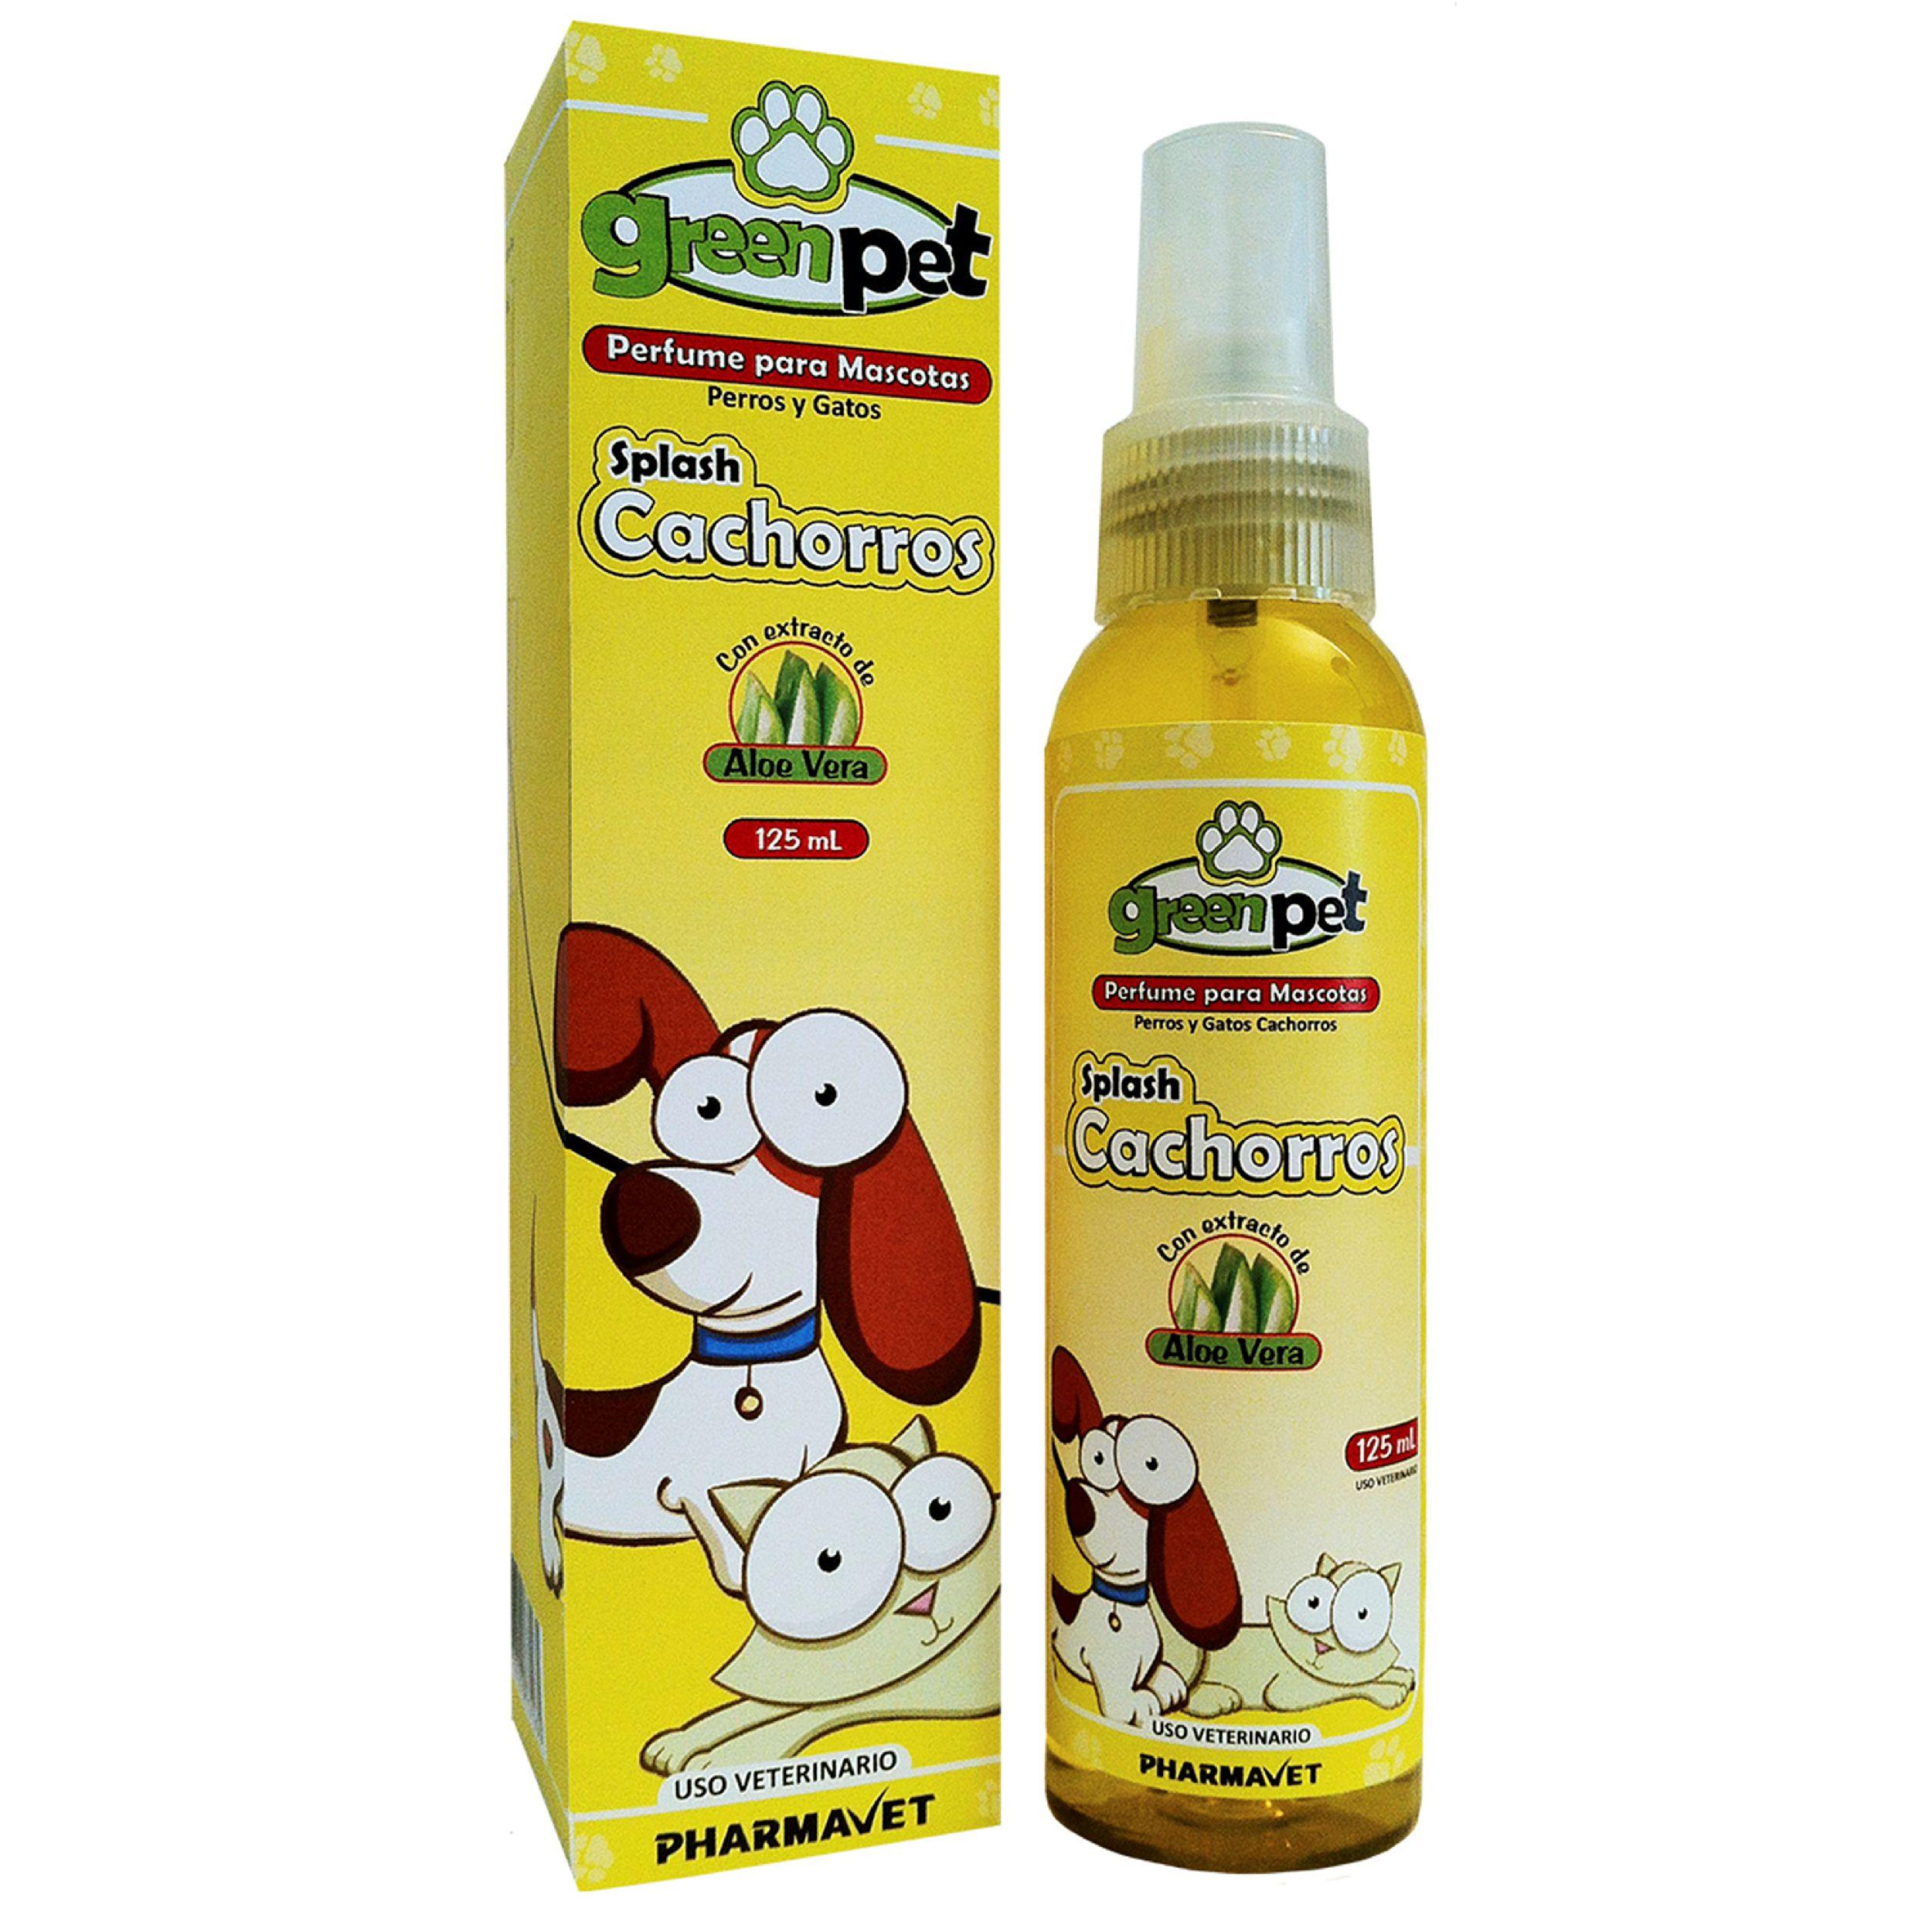 Perfume Cachorros